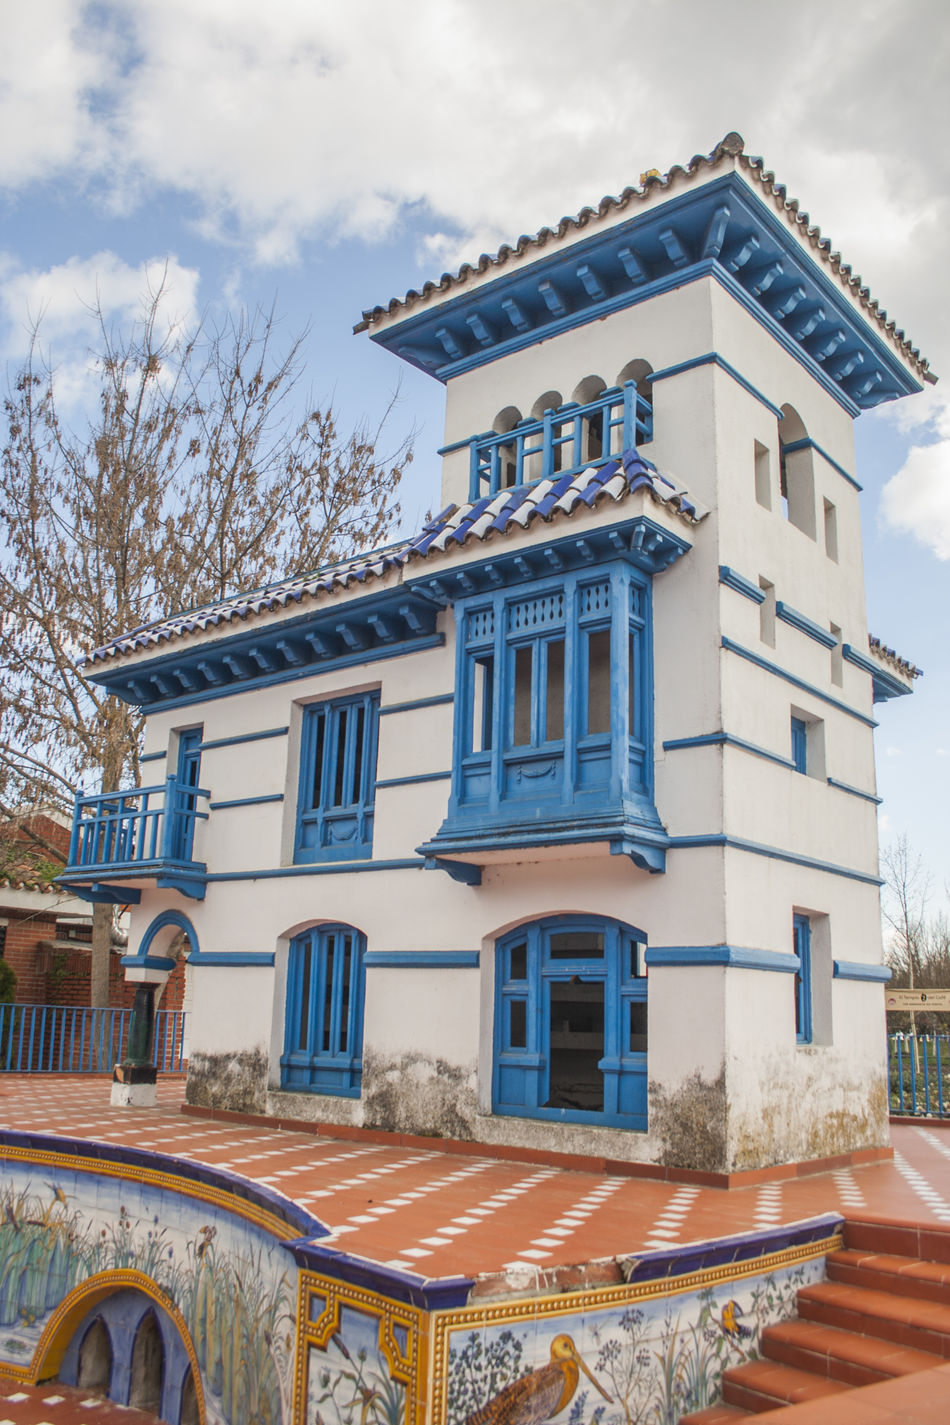 Architecture Balcony Building Exterior Built Structure Ceramic Ceramic Art Ceramic Tiles Ceramics Day España Home No People Outdoors Sky SPAIN Talavera Talavera De La Reina Talavera Pottery Toledo Toledo Spain Tree